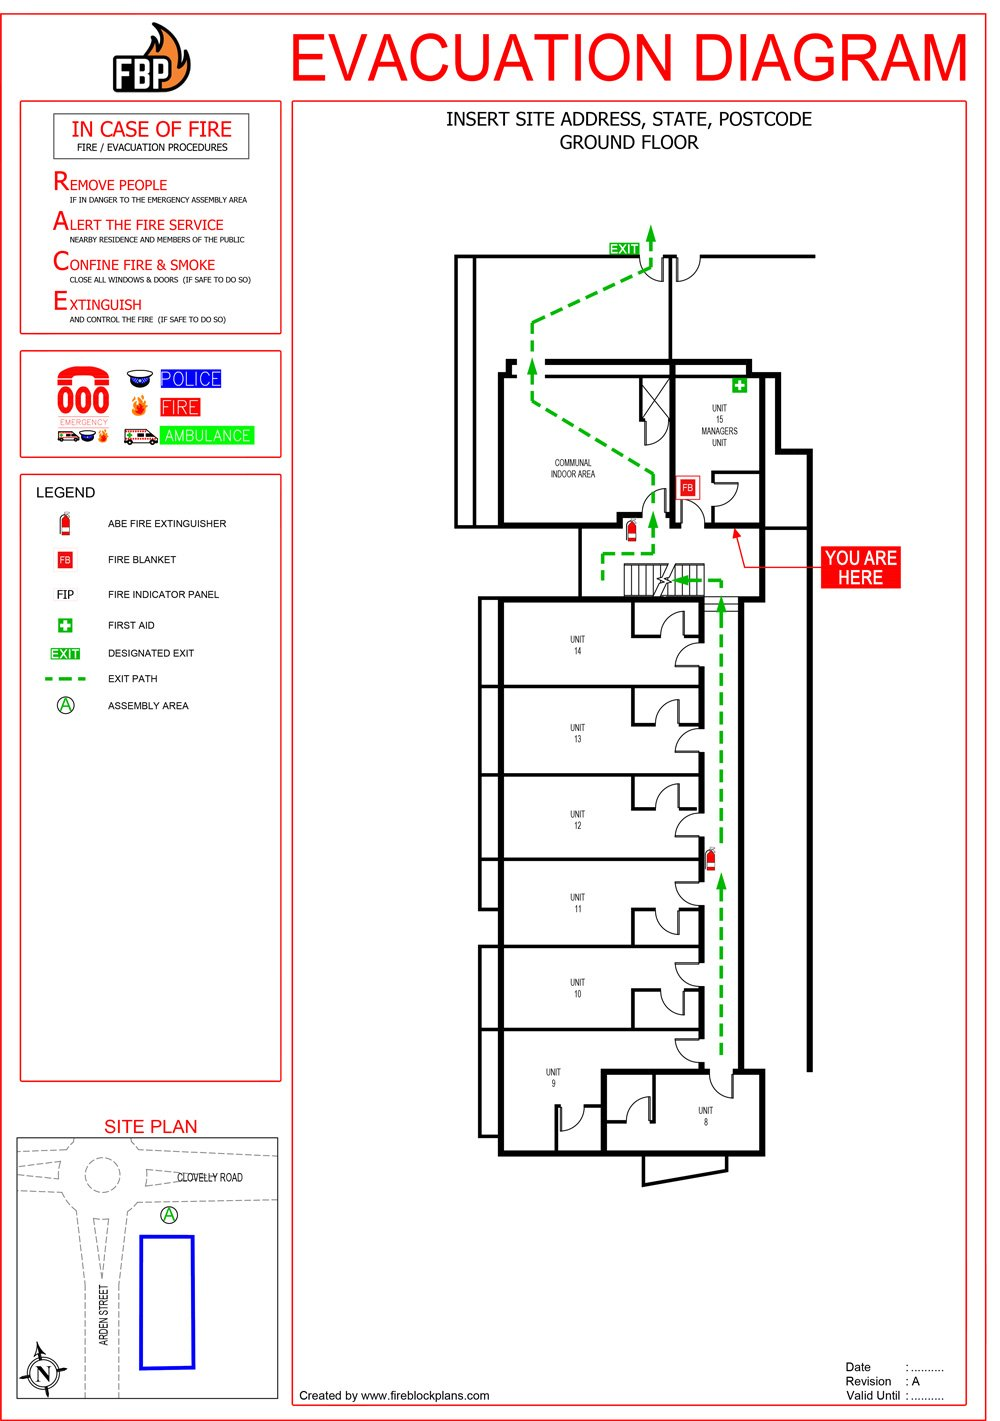 Emergency Evacuation Diagrams Australia - Fire Protection Australia